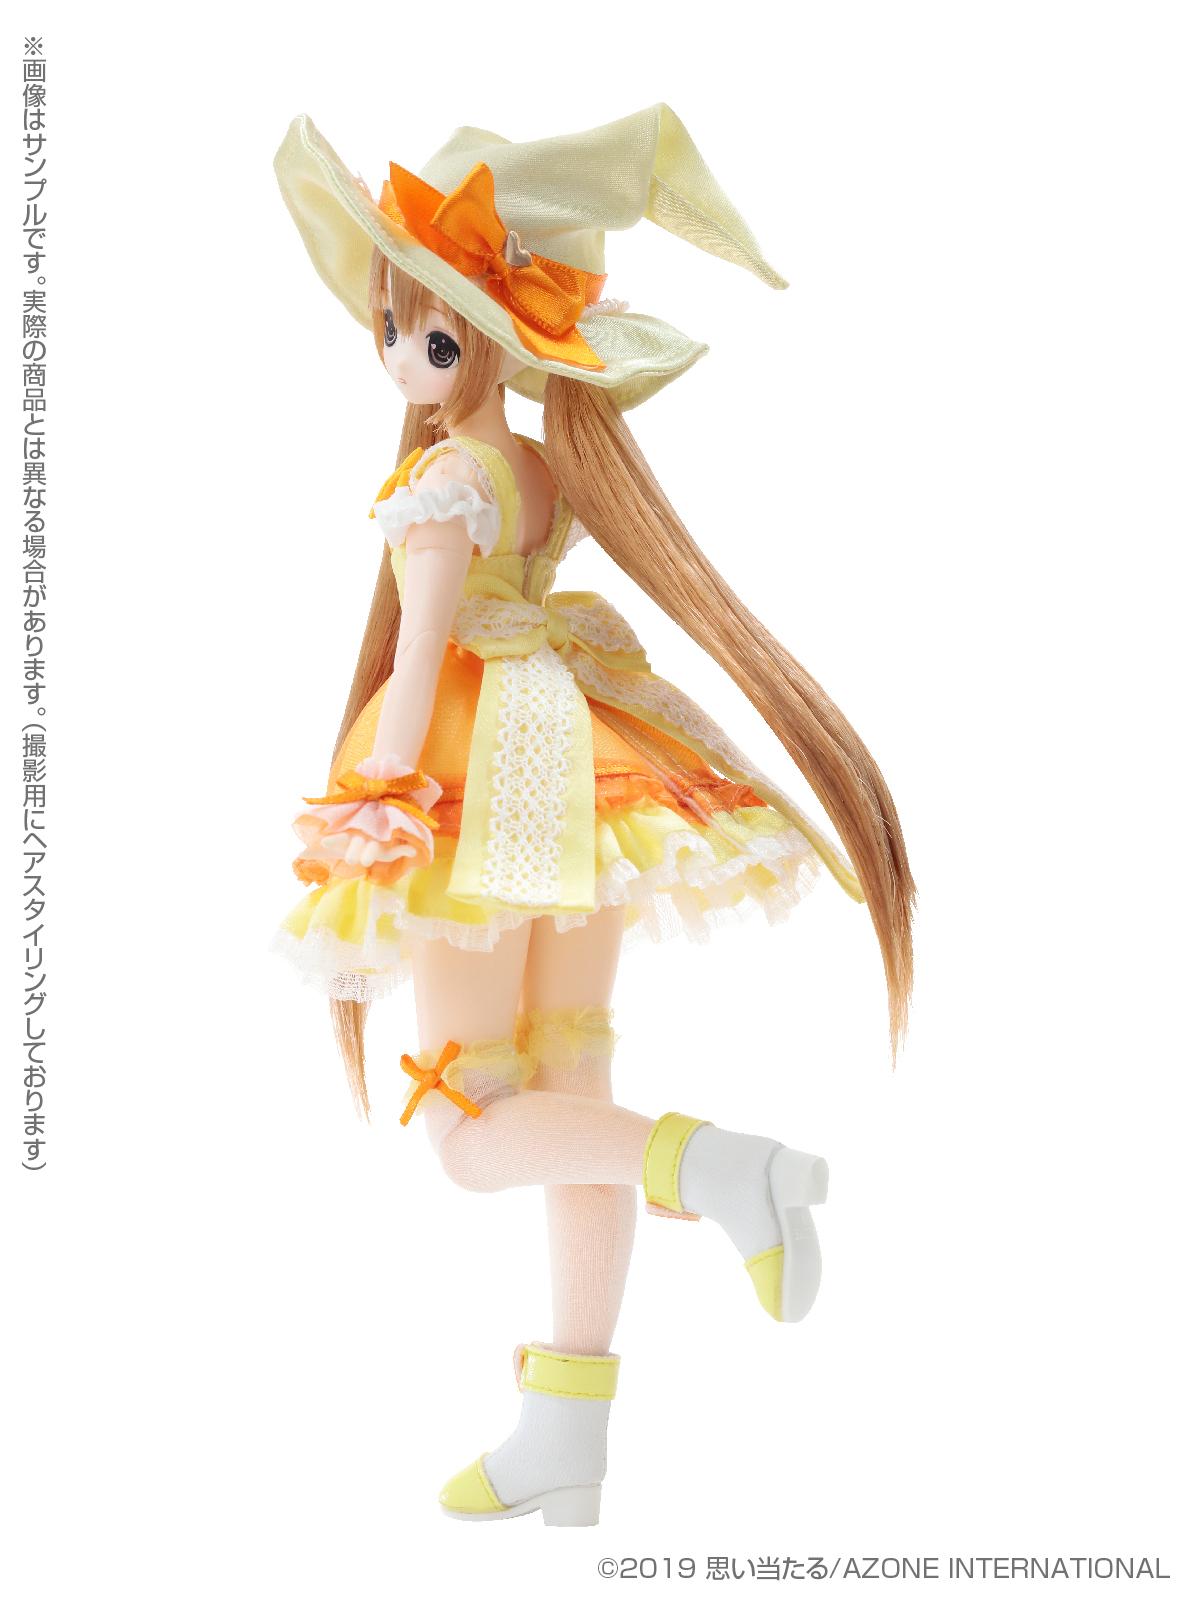 Magical☆CUTE『Pure Heart Chiika(ピュアハート ちいか)』えっくす☆きゅーと 1/6 完成品ドール-005